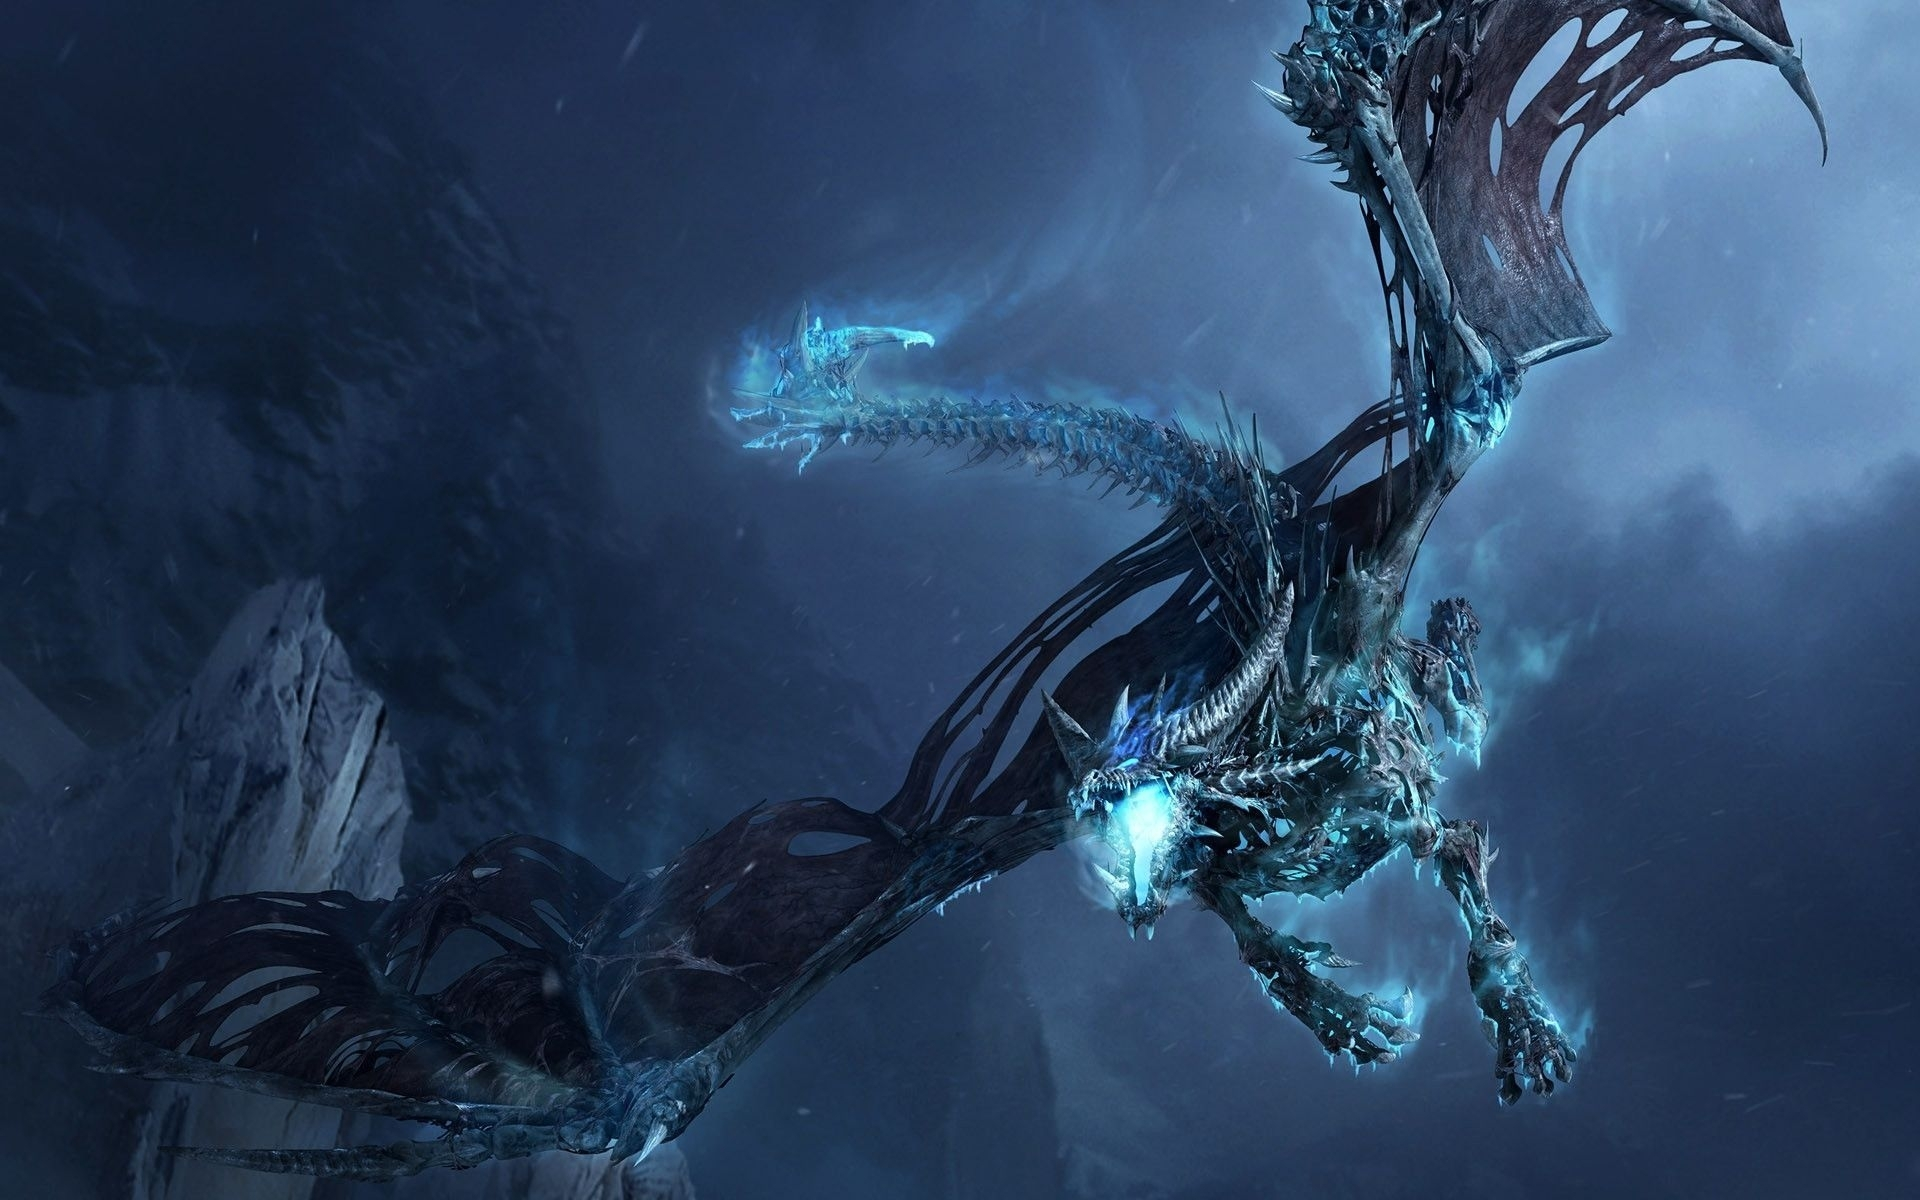 epic dragon wallpaper hd - imgur